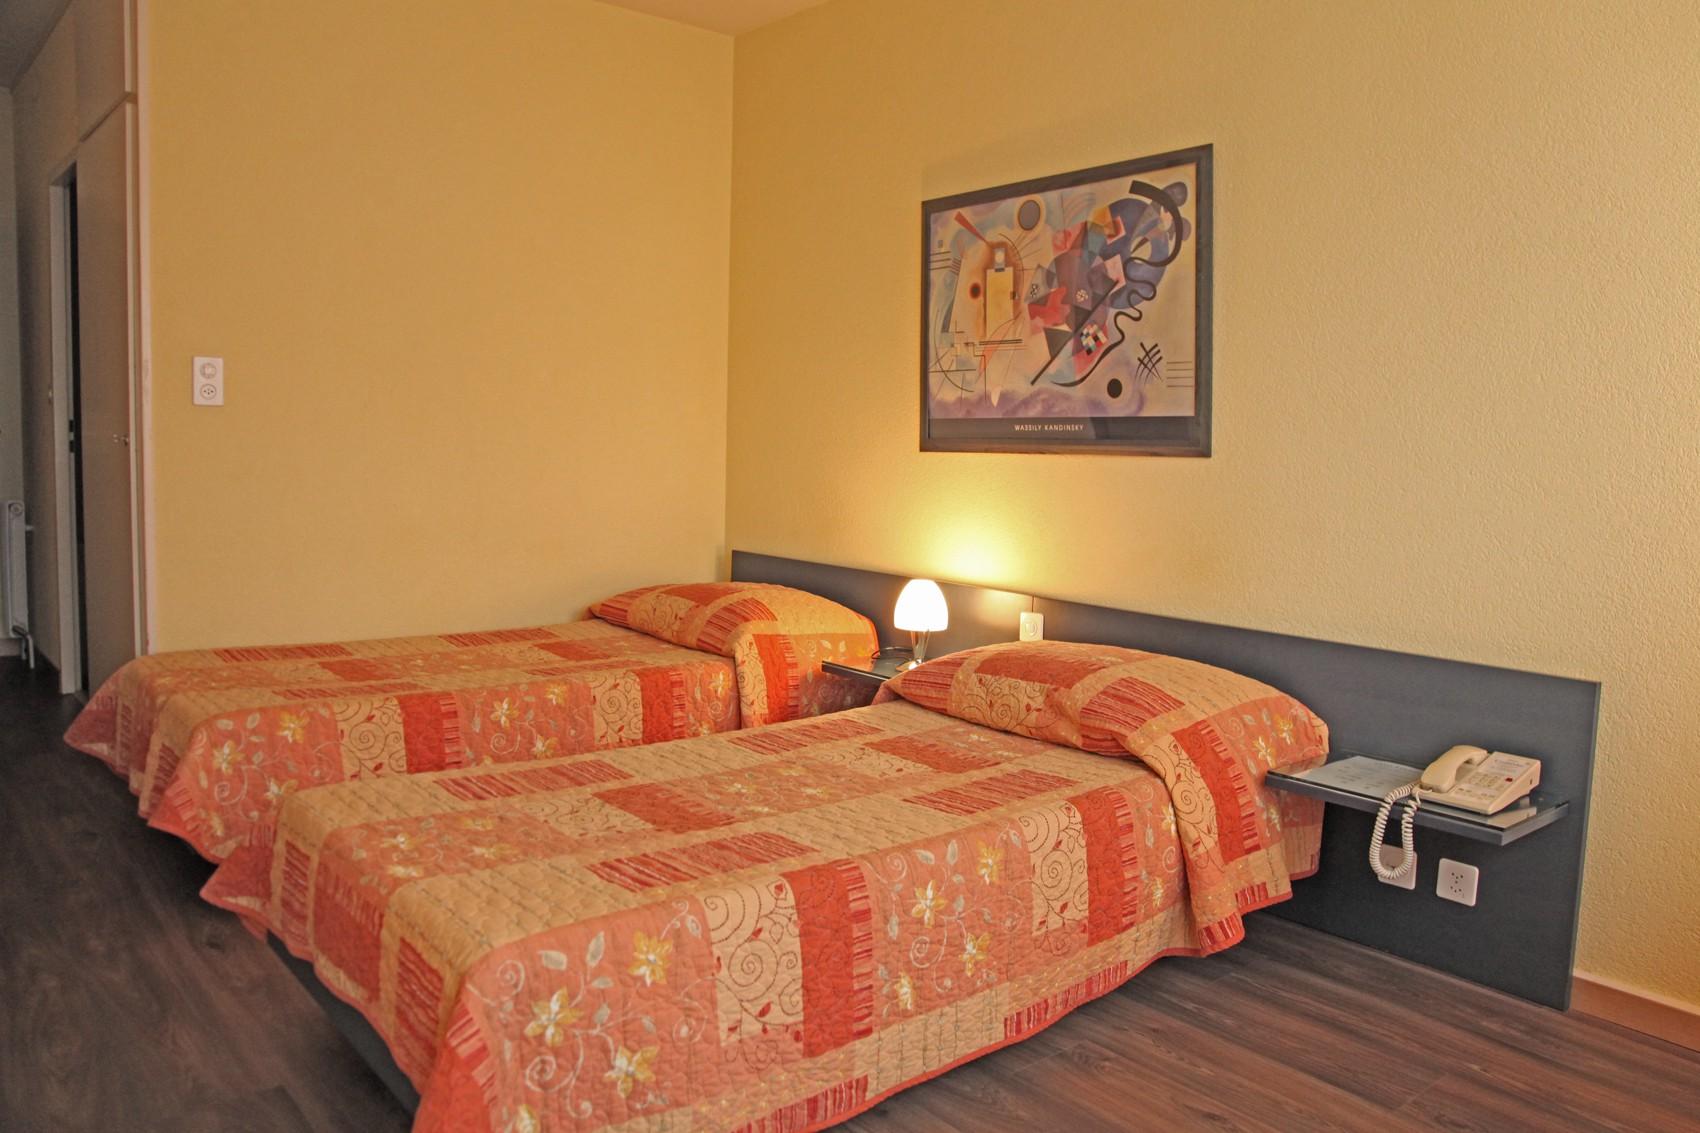 chambres-hotel-3-etoiles-plainpalais